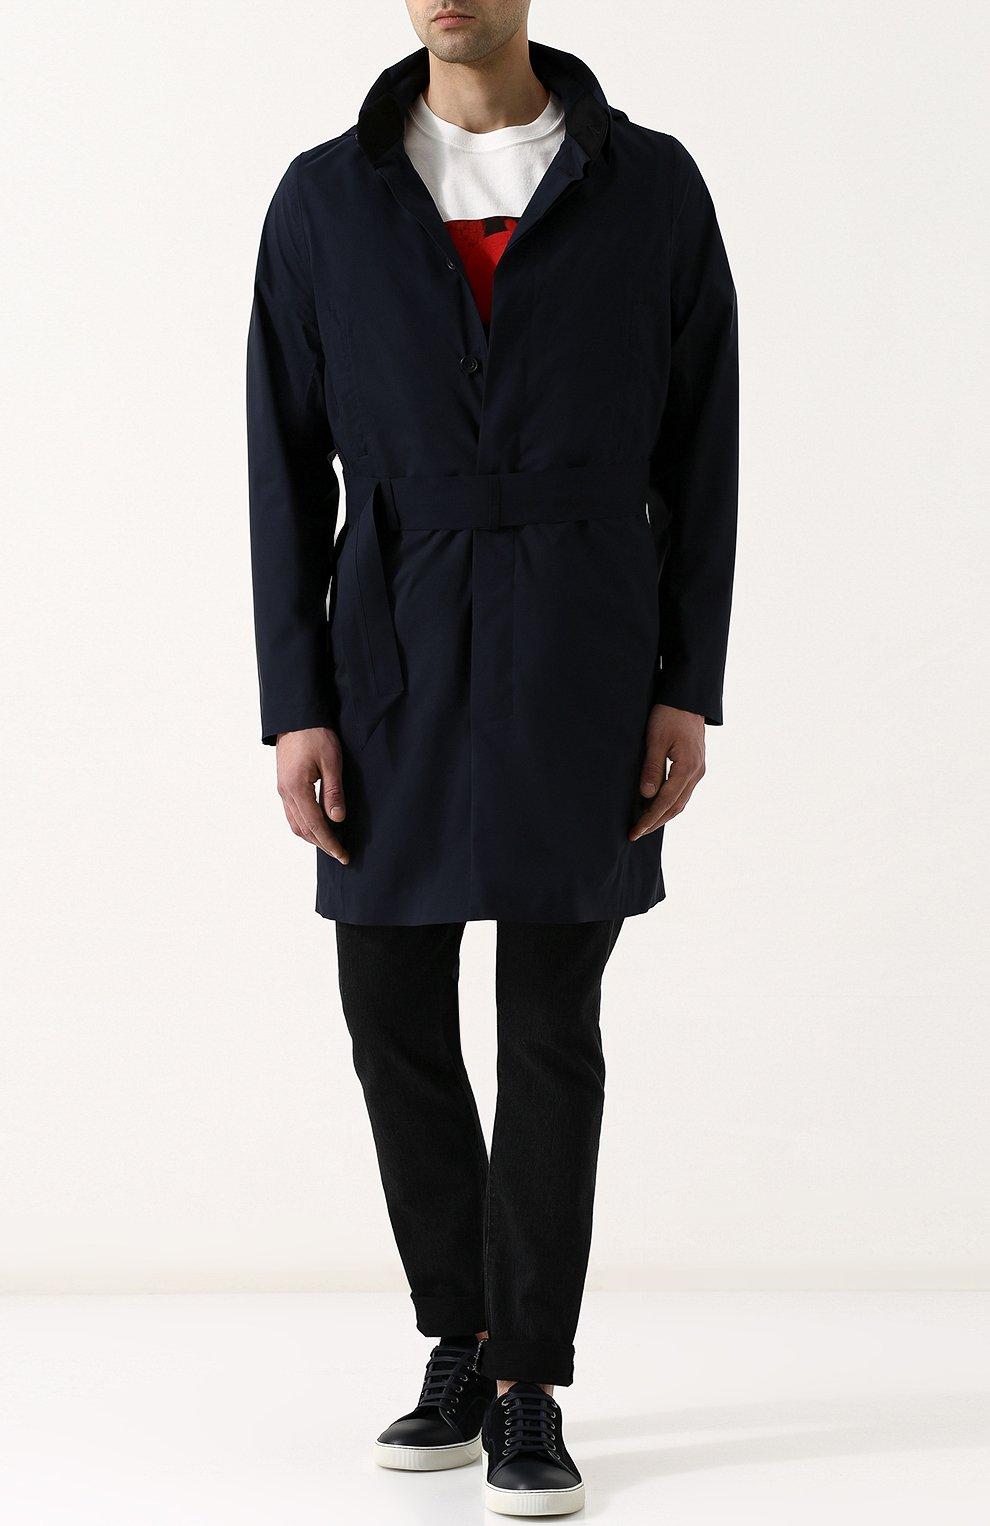 Мужской однобортный плащ на пуговицах с капюшоном NORWEGIAN RAIN темно-синего цвета, арт. SINGLE BREASTED MID/SLW | Фото 2